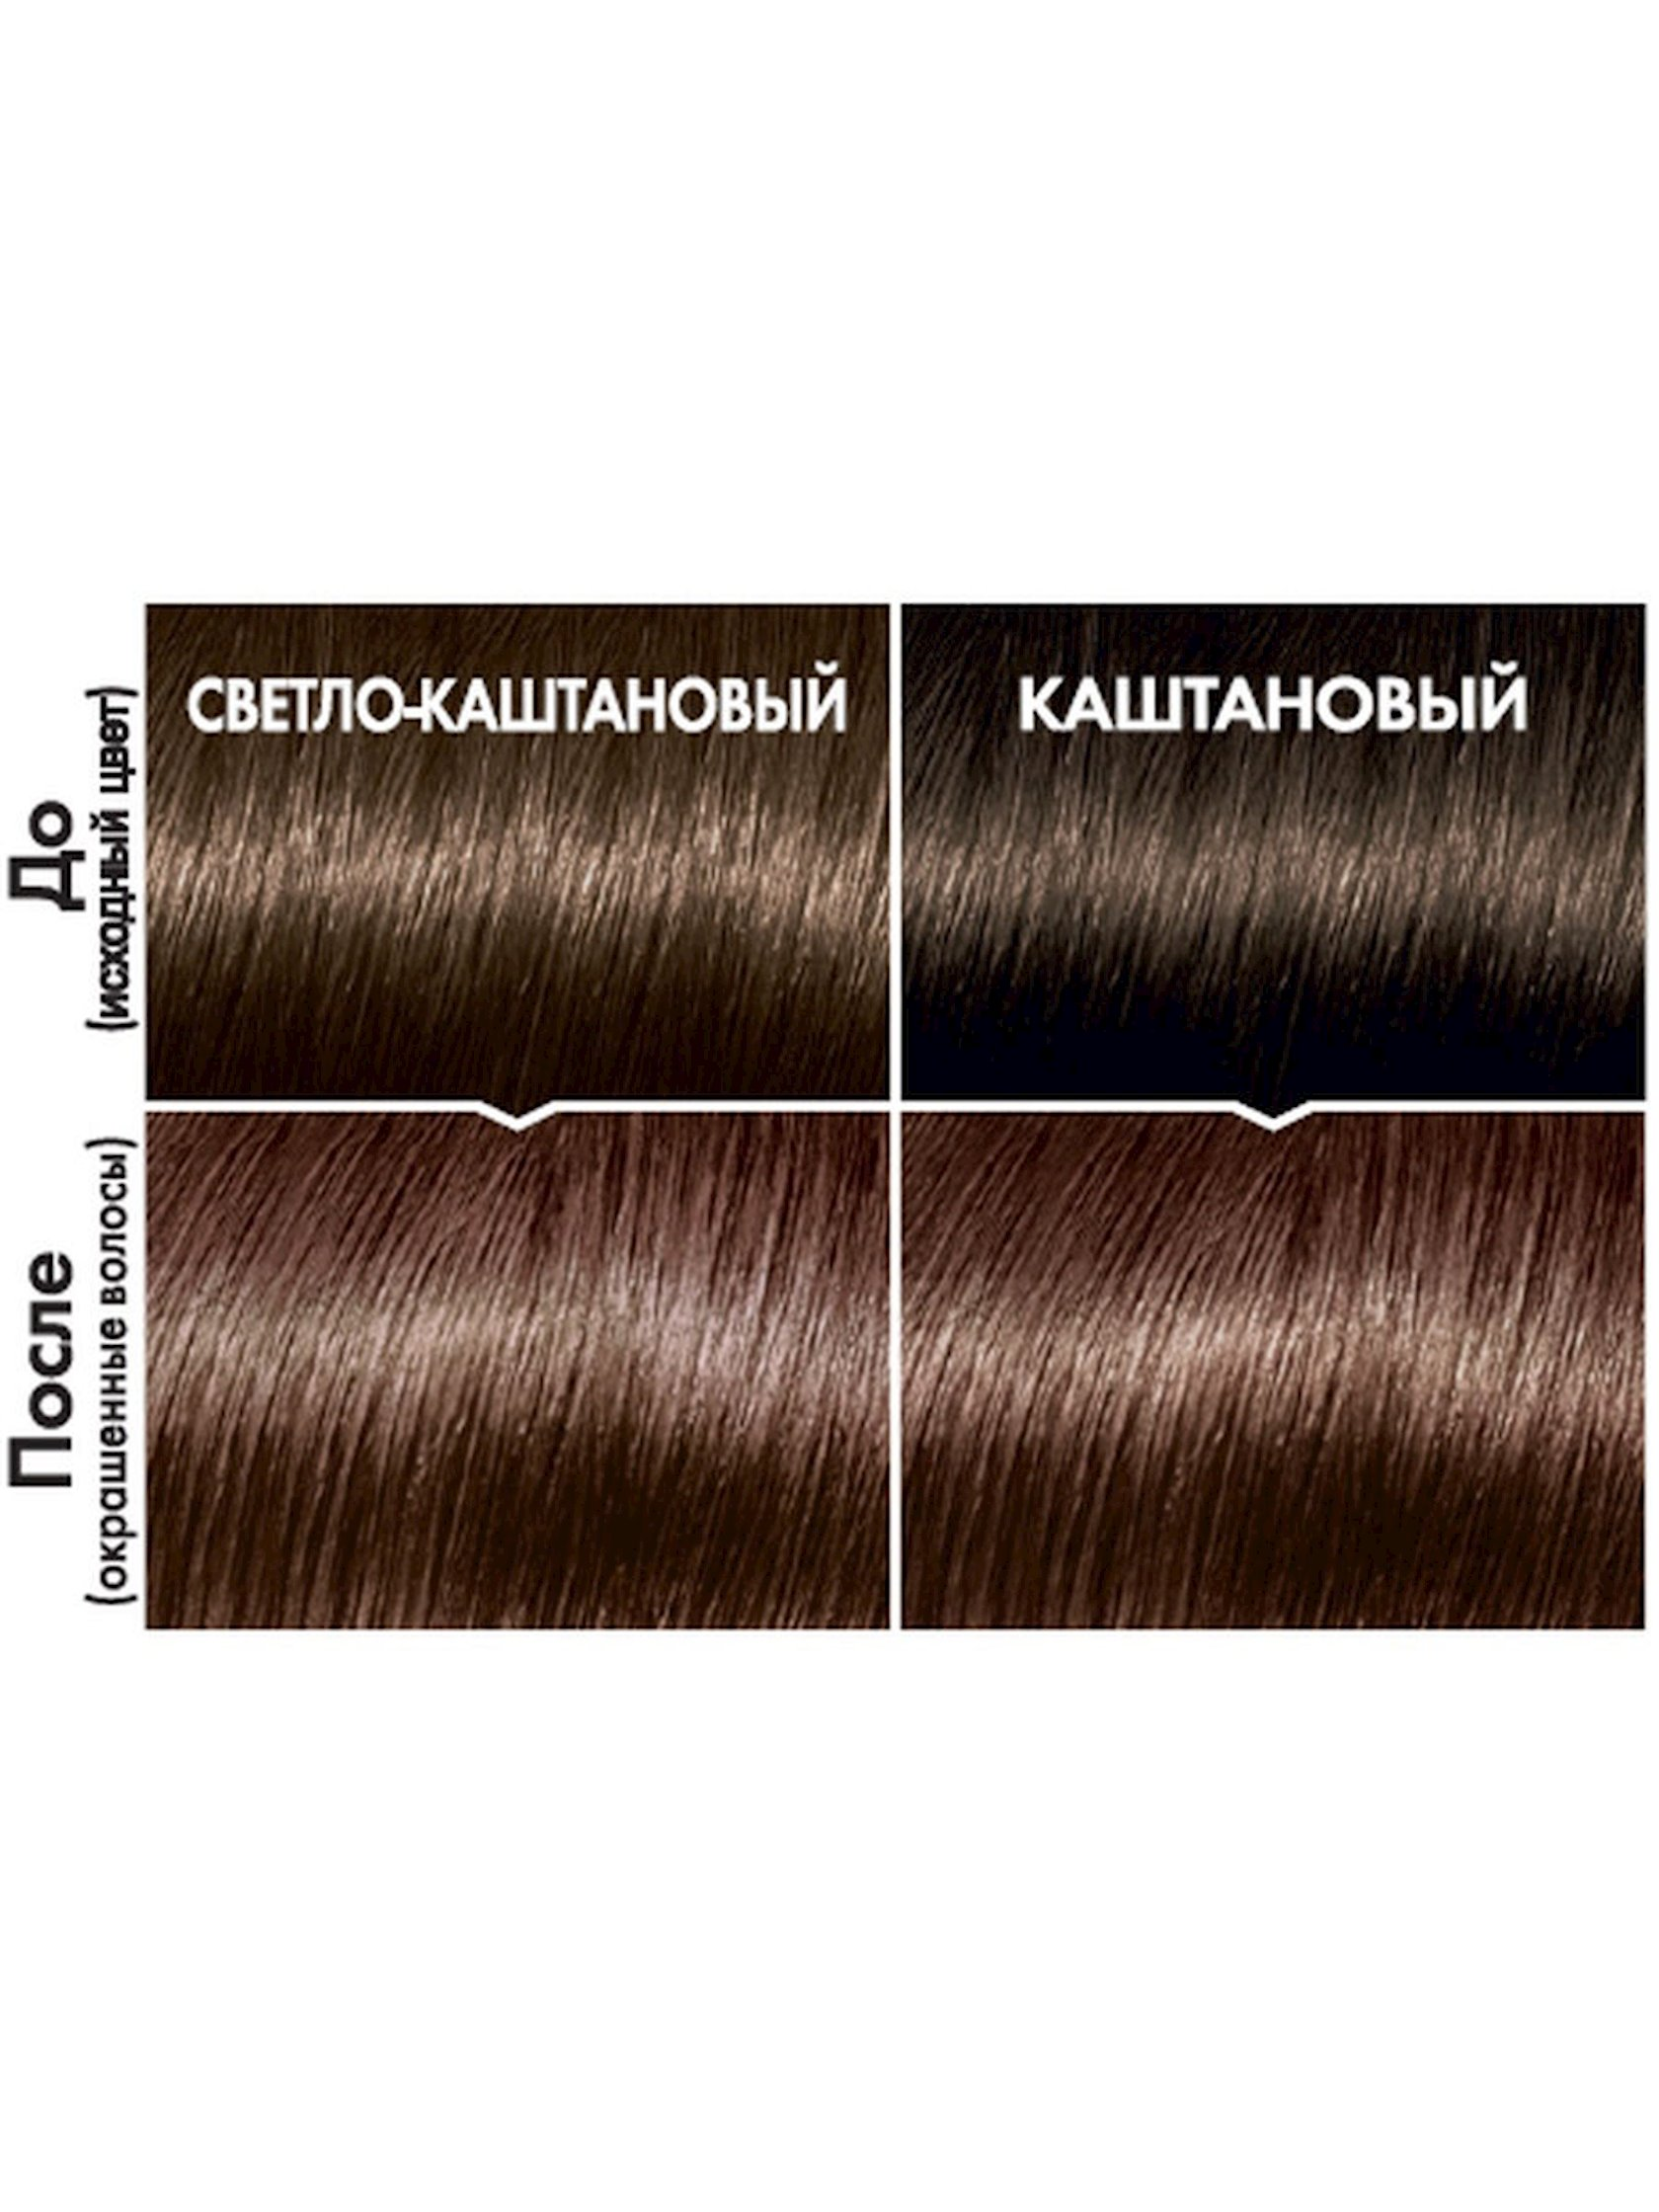 Saç üçün qalıcı krem-boya L'Oréal Paris Casting Creme Gloss ammonyaksız 415 Buzlu şabalıd